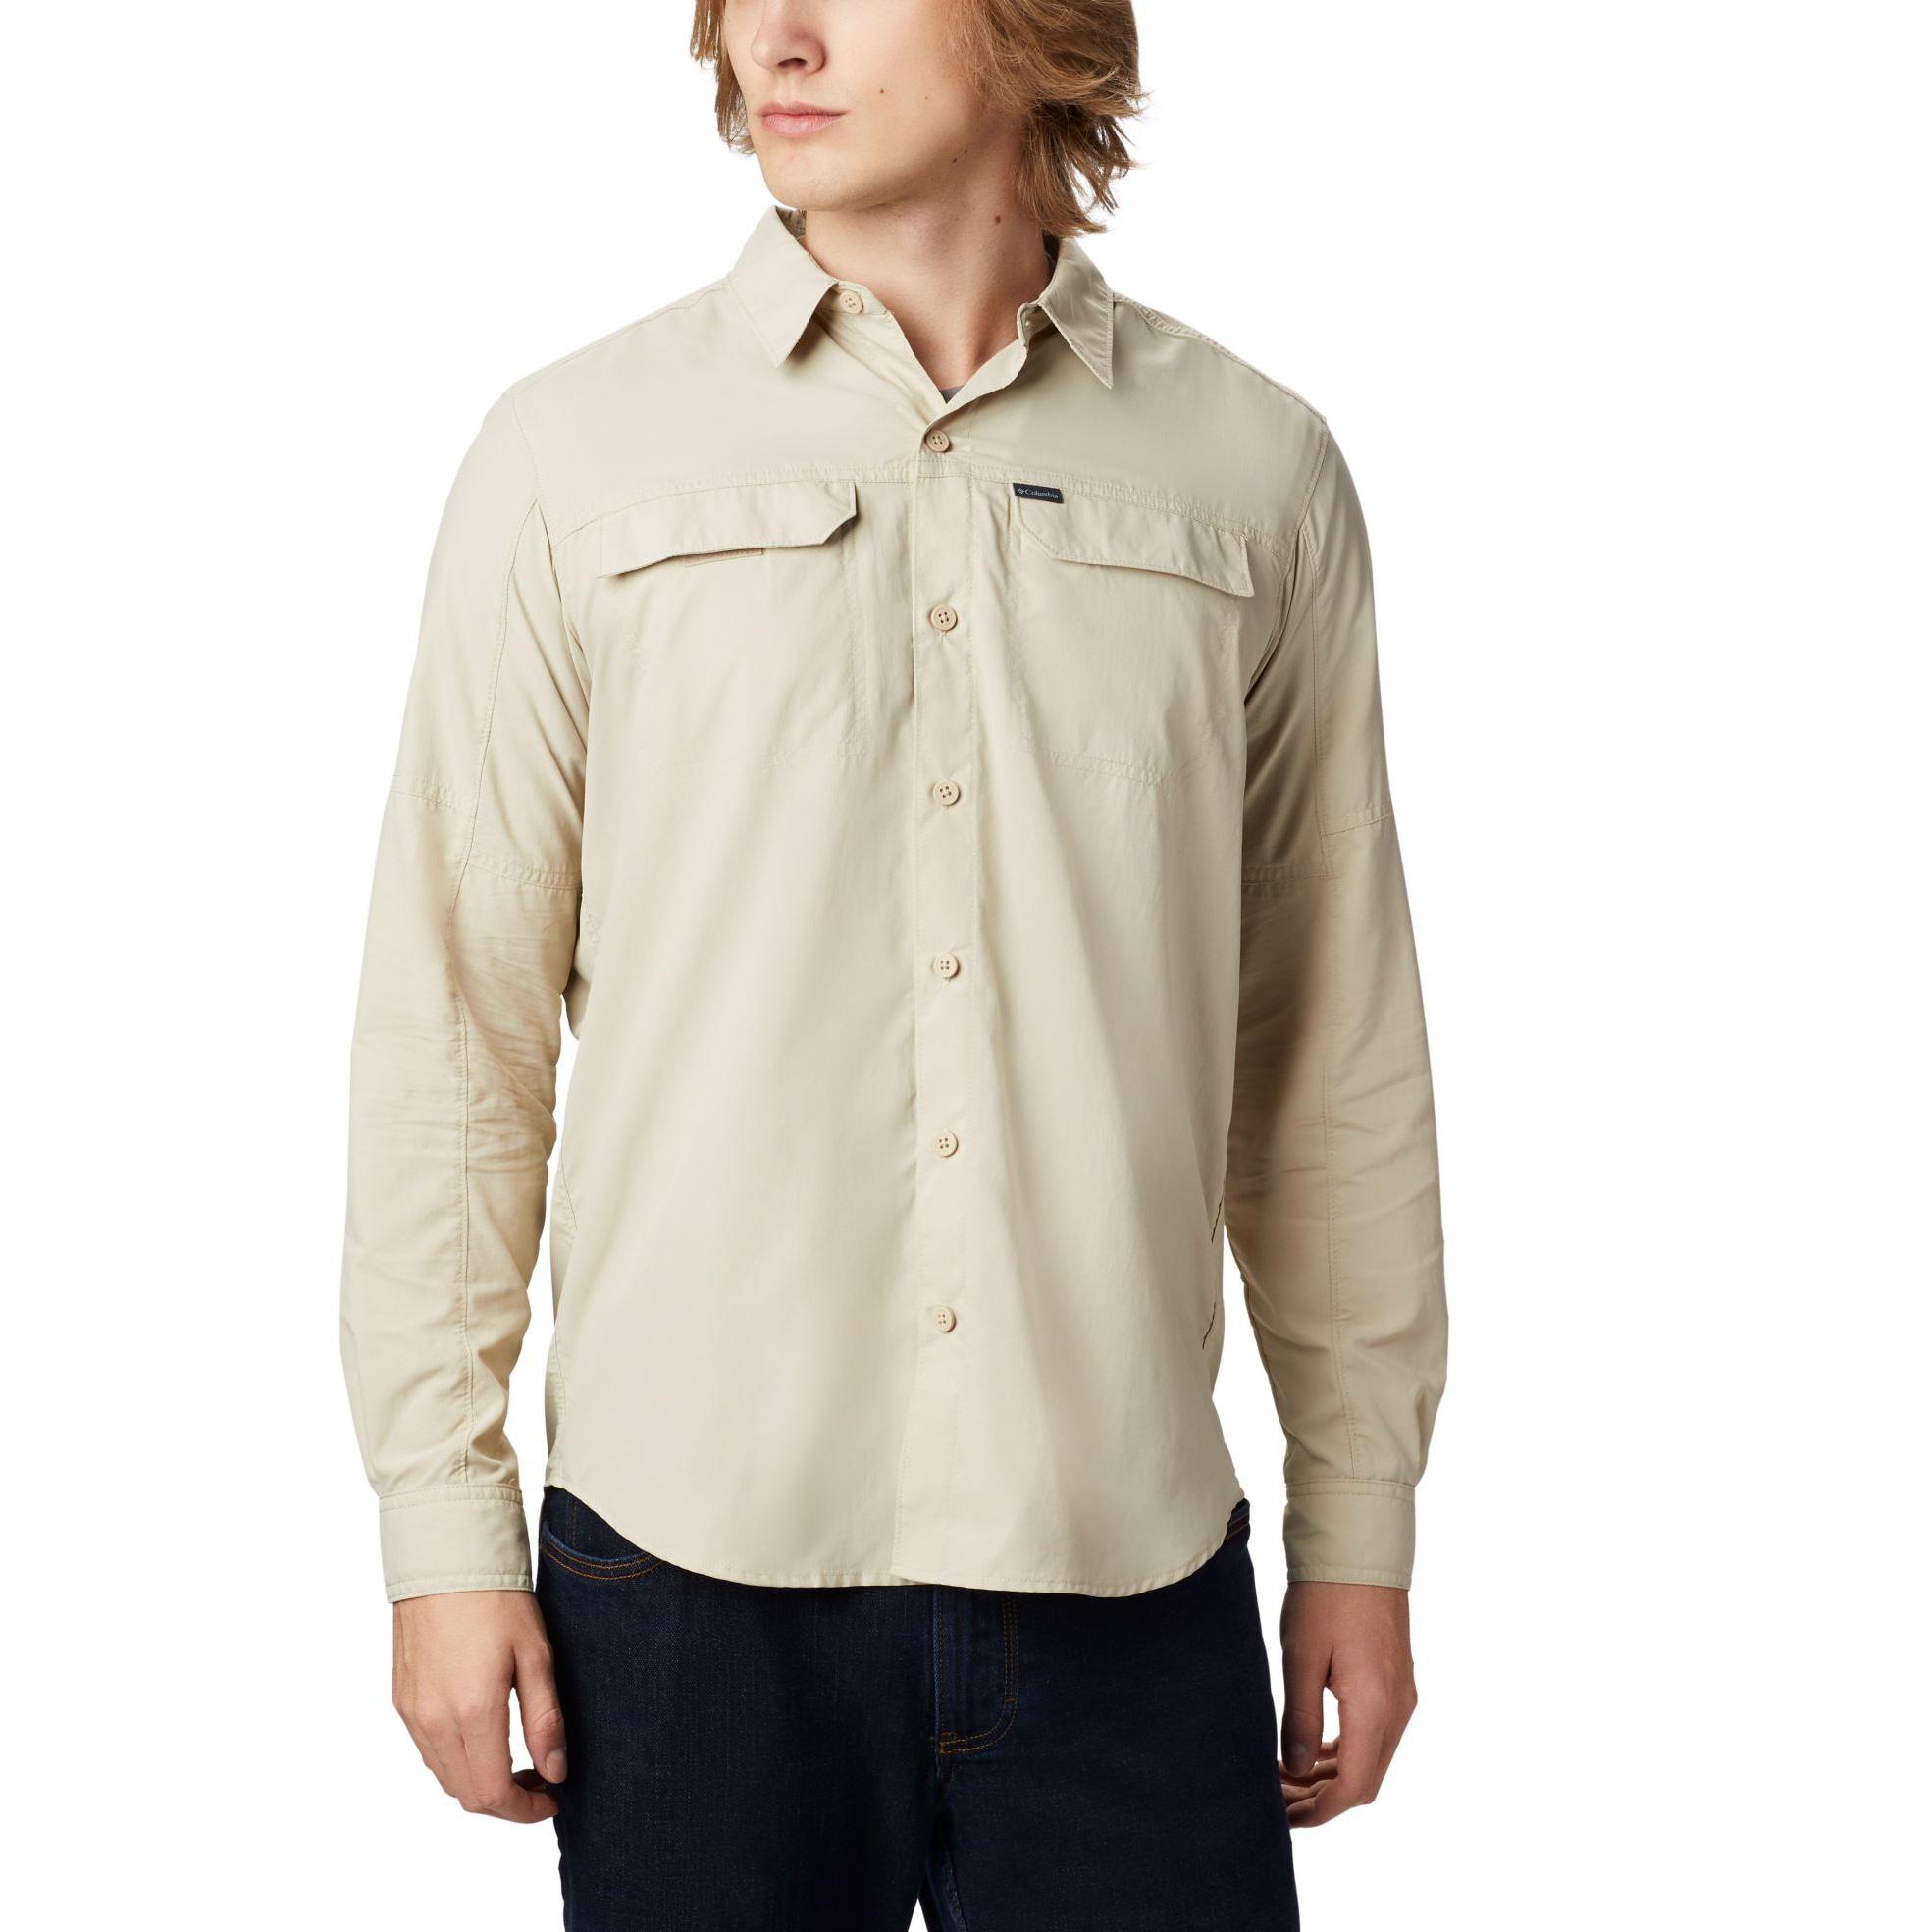 Silver Ridge 2.0 Shirt Long Sleeve Tall - Men's